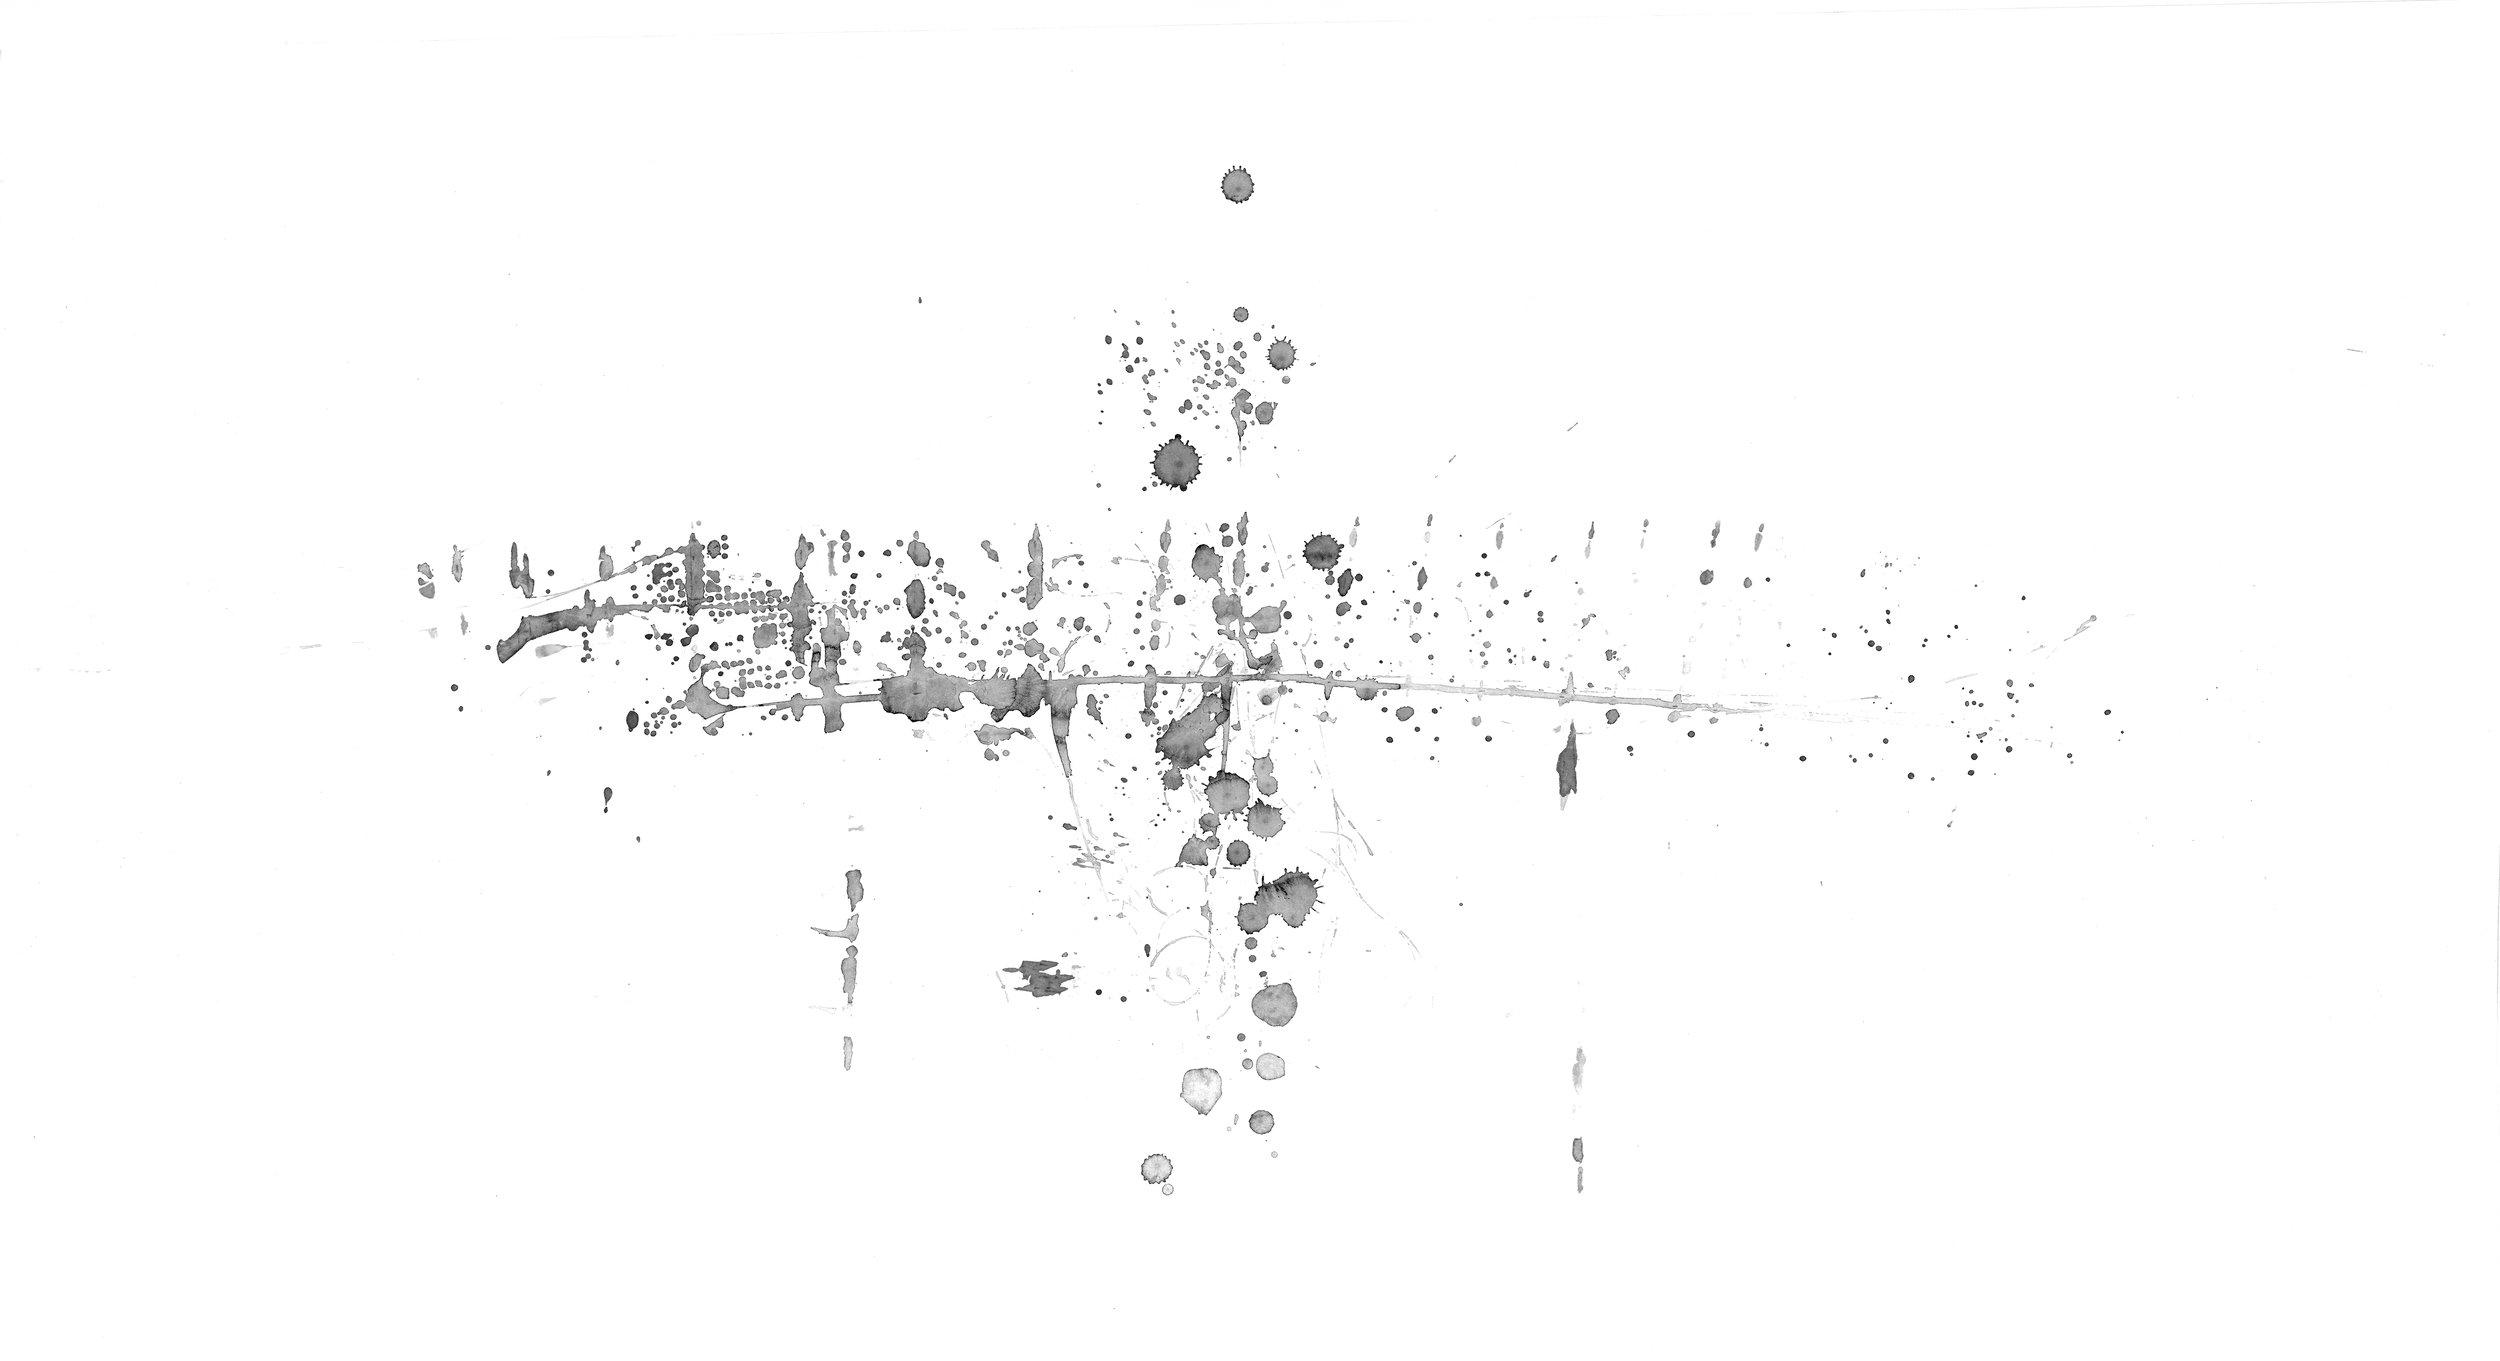 JSP276_A2_DWG_DrawingMachineResultDrawing.jpg